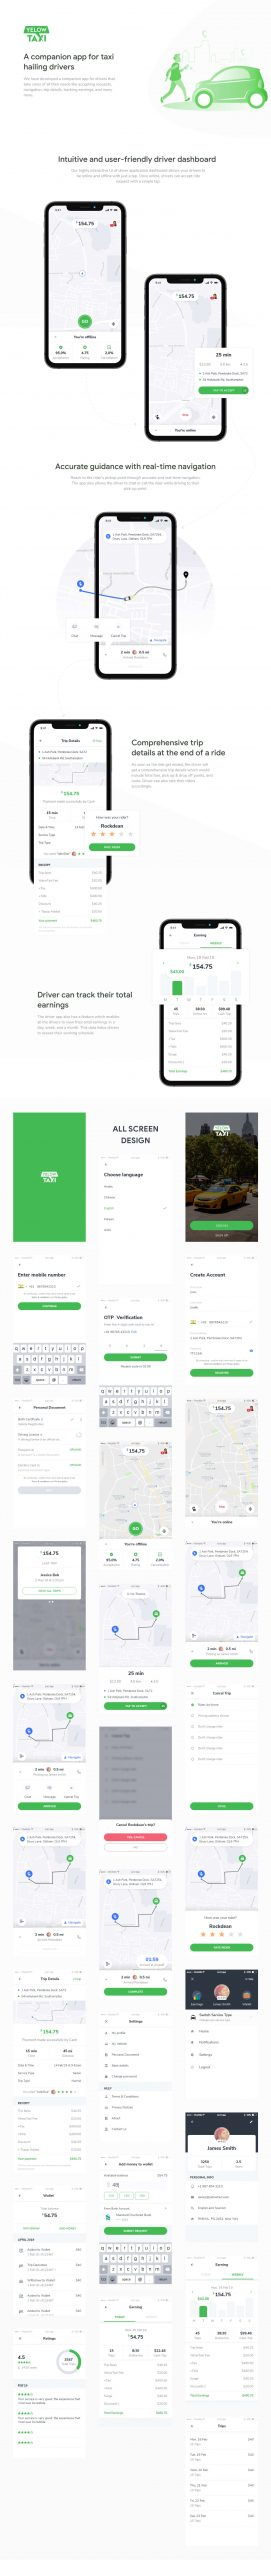 Taxi Booking App UI Kit Free Download - UI Freebies